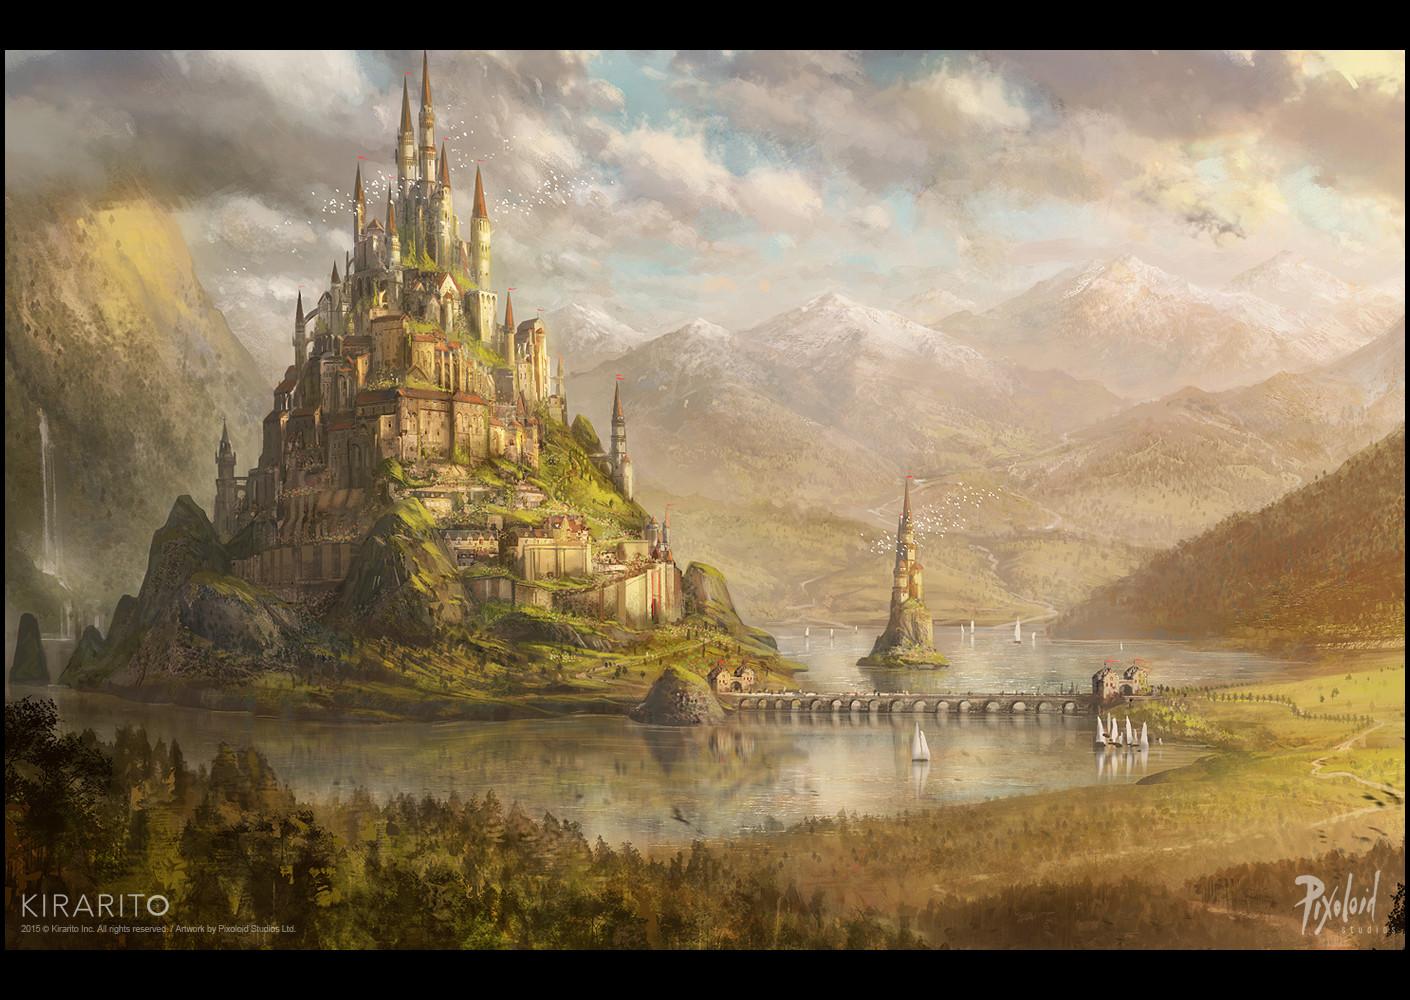 Ambientación - Situación actual de Ryouzan:  Pixoloid-studios-kirarito-fantasy-castle-c-pixoloid-studios